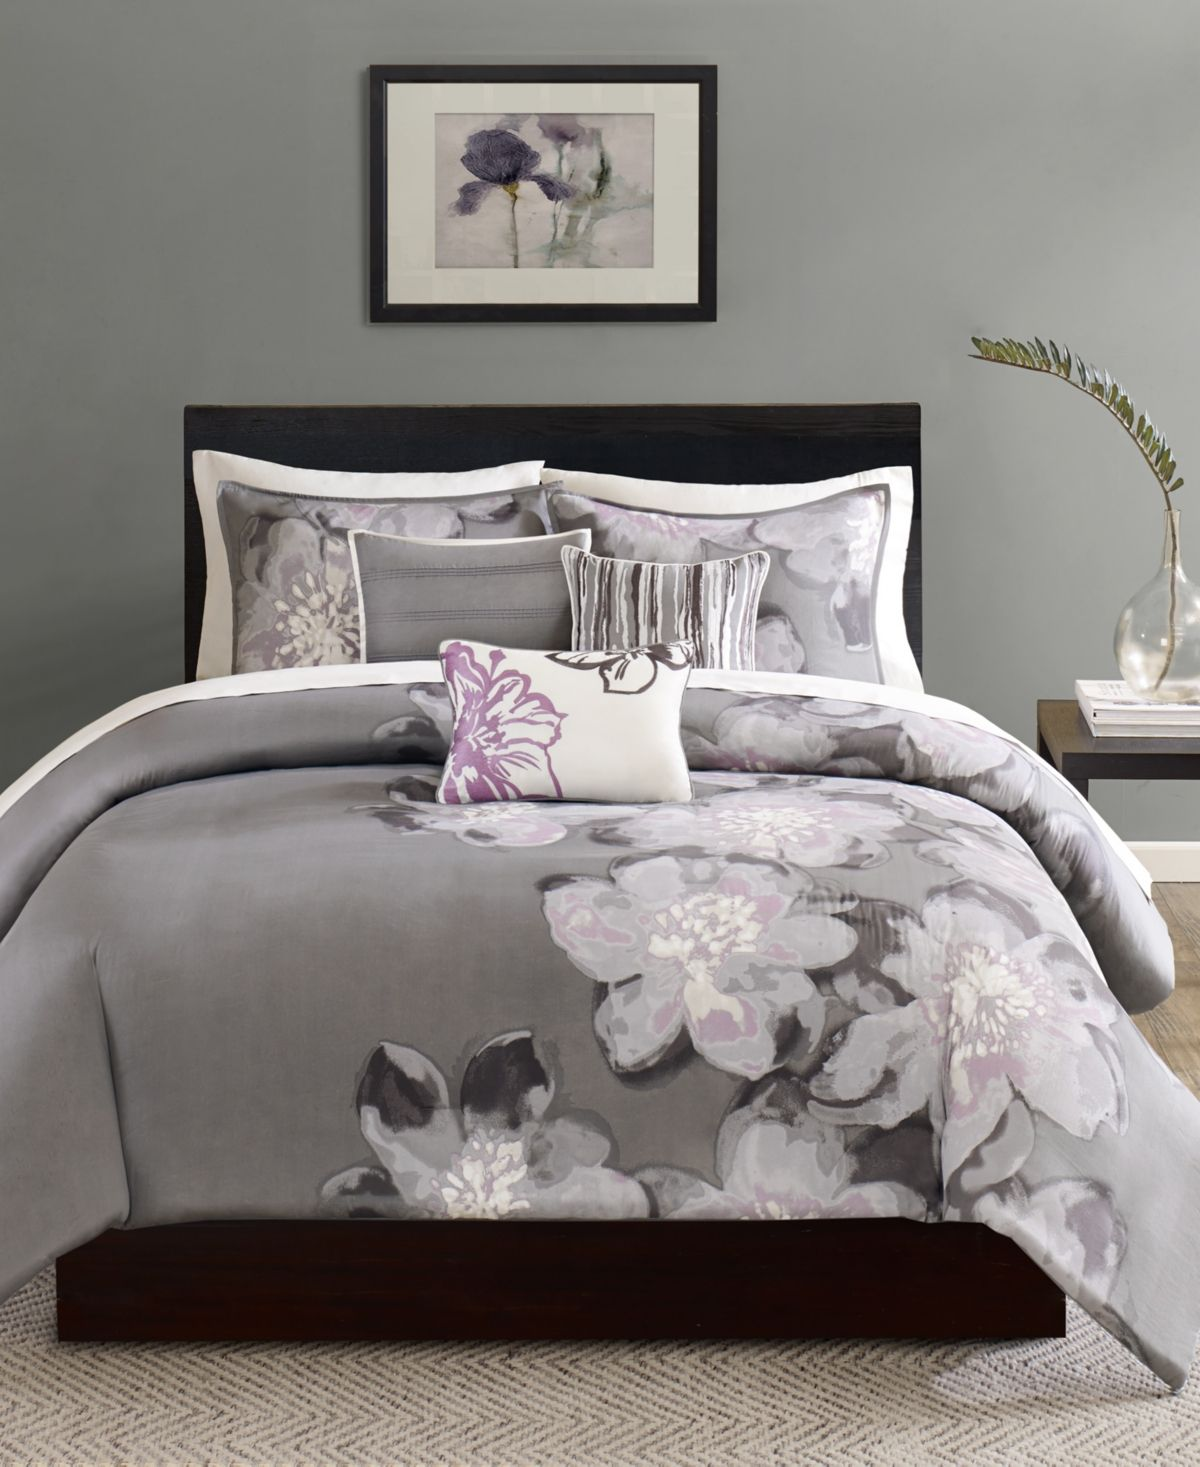 Madison Park Serena Bedding Sets & Reviews Bed in a Bag